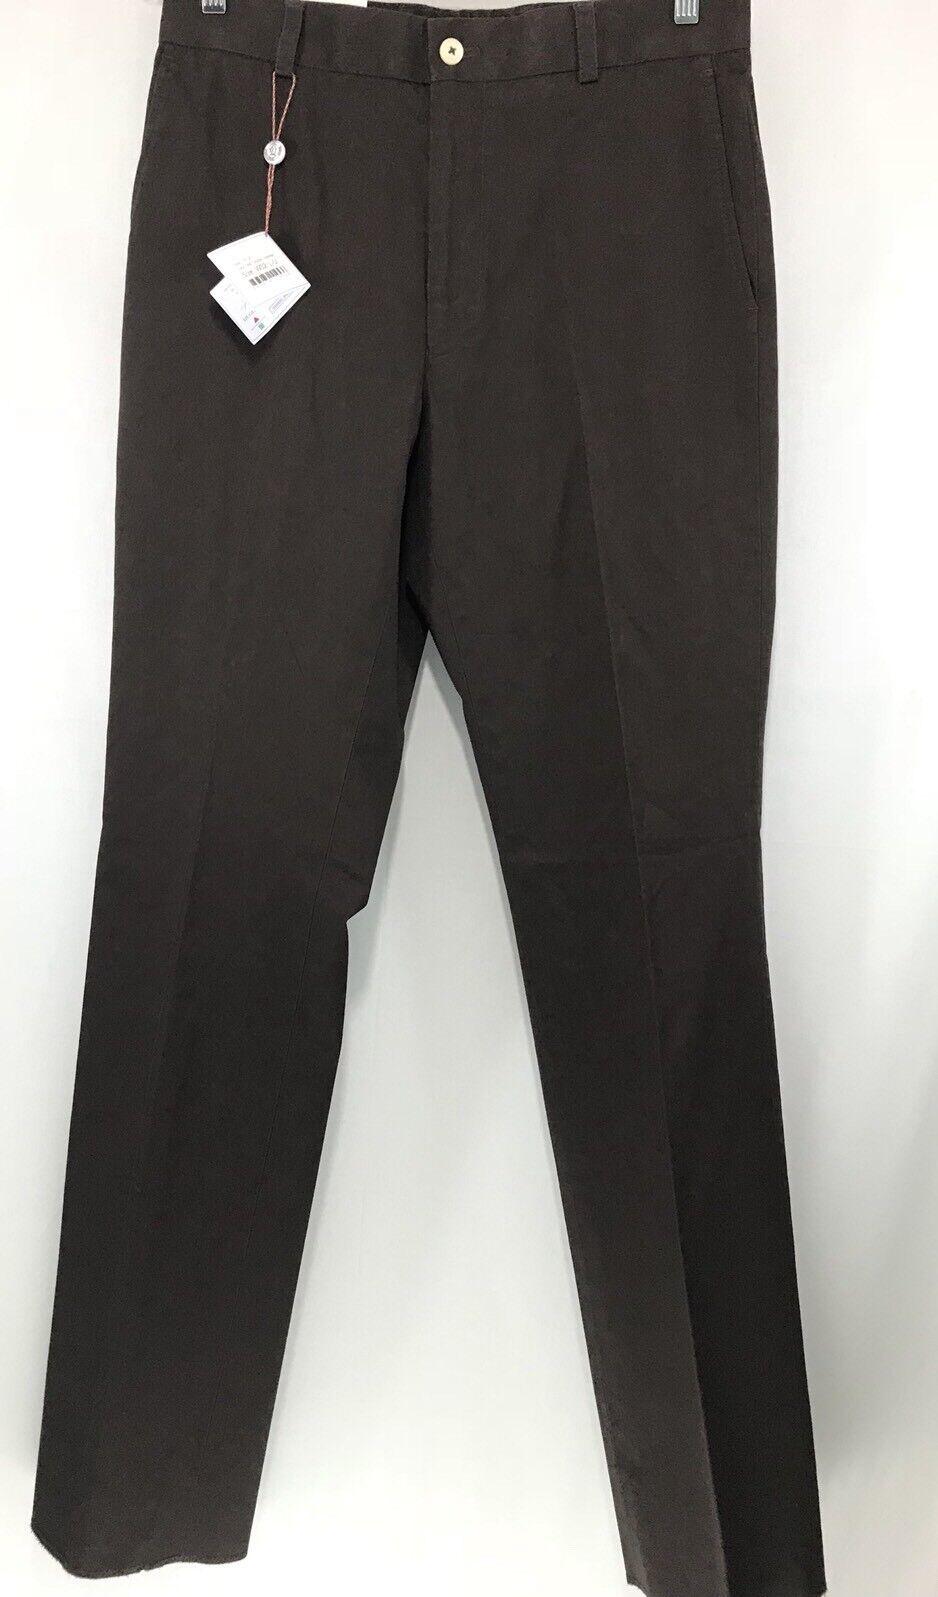 Men's 32x37 Southern Tide Double Expresso Cotton Elastane Flat Front Pants NWT